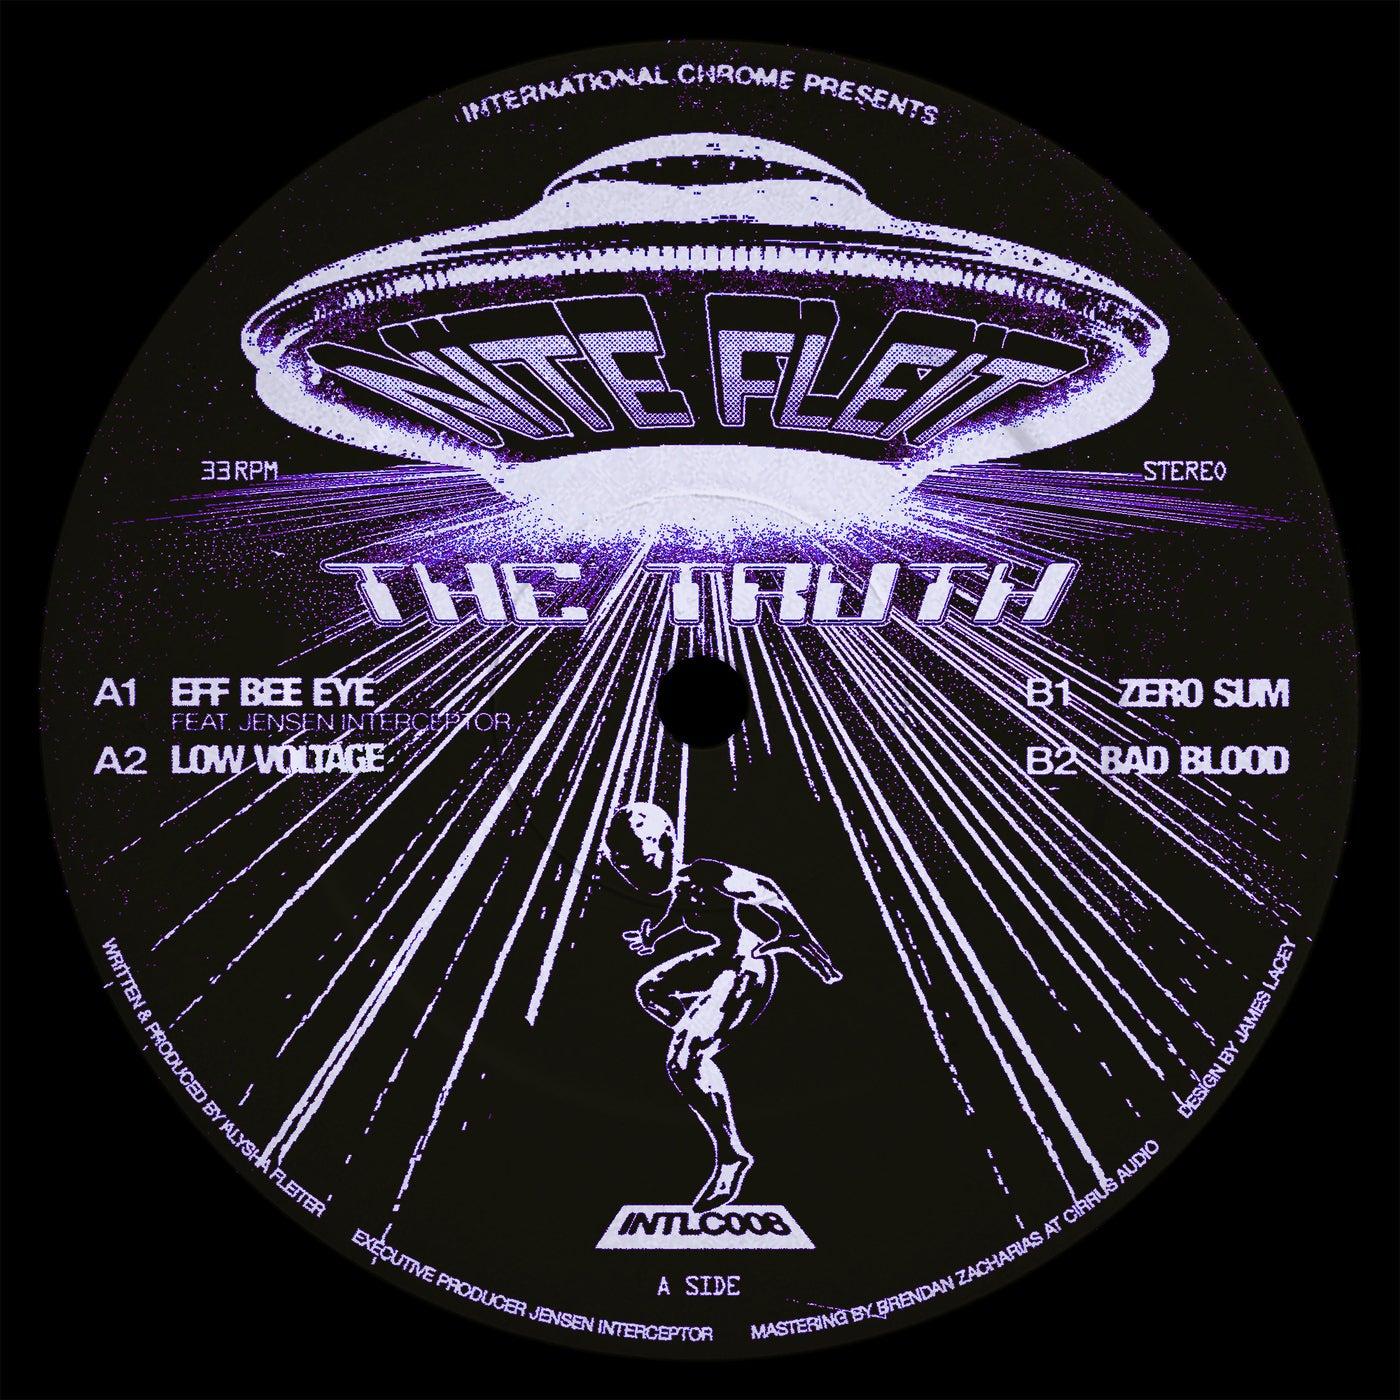 Effe Bee Eye feat. Jensen Interceptor (Original Mix)